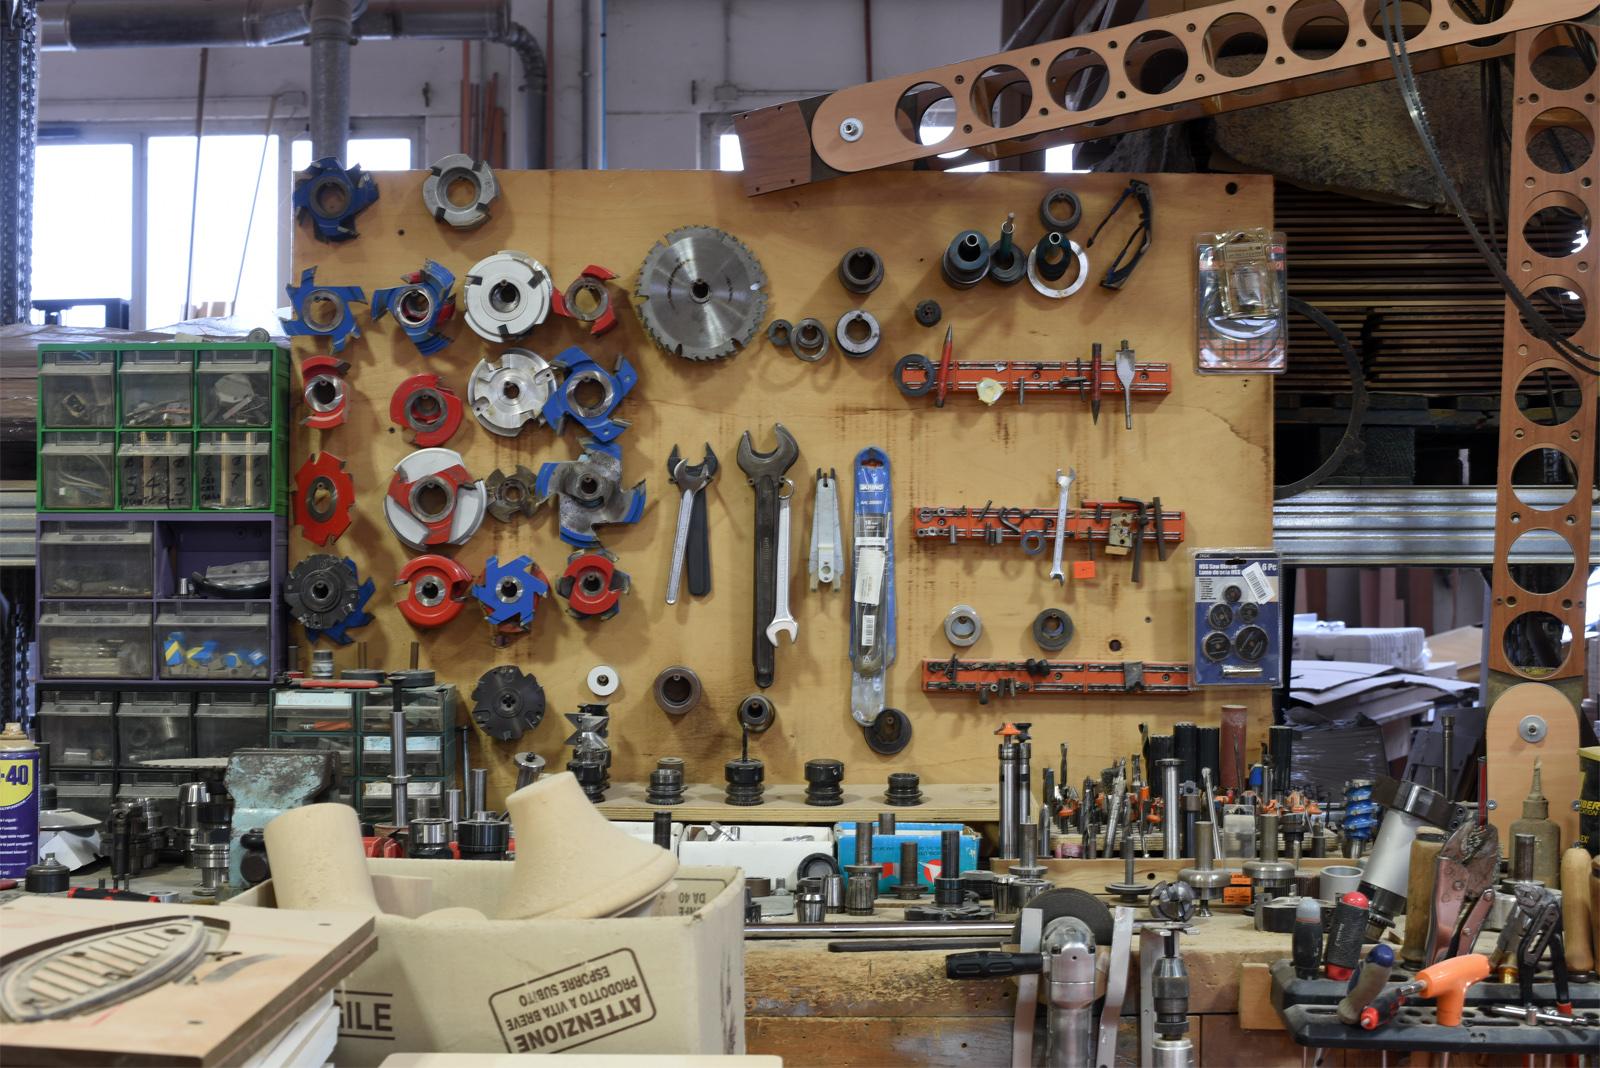 Tools. Lots of them.